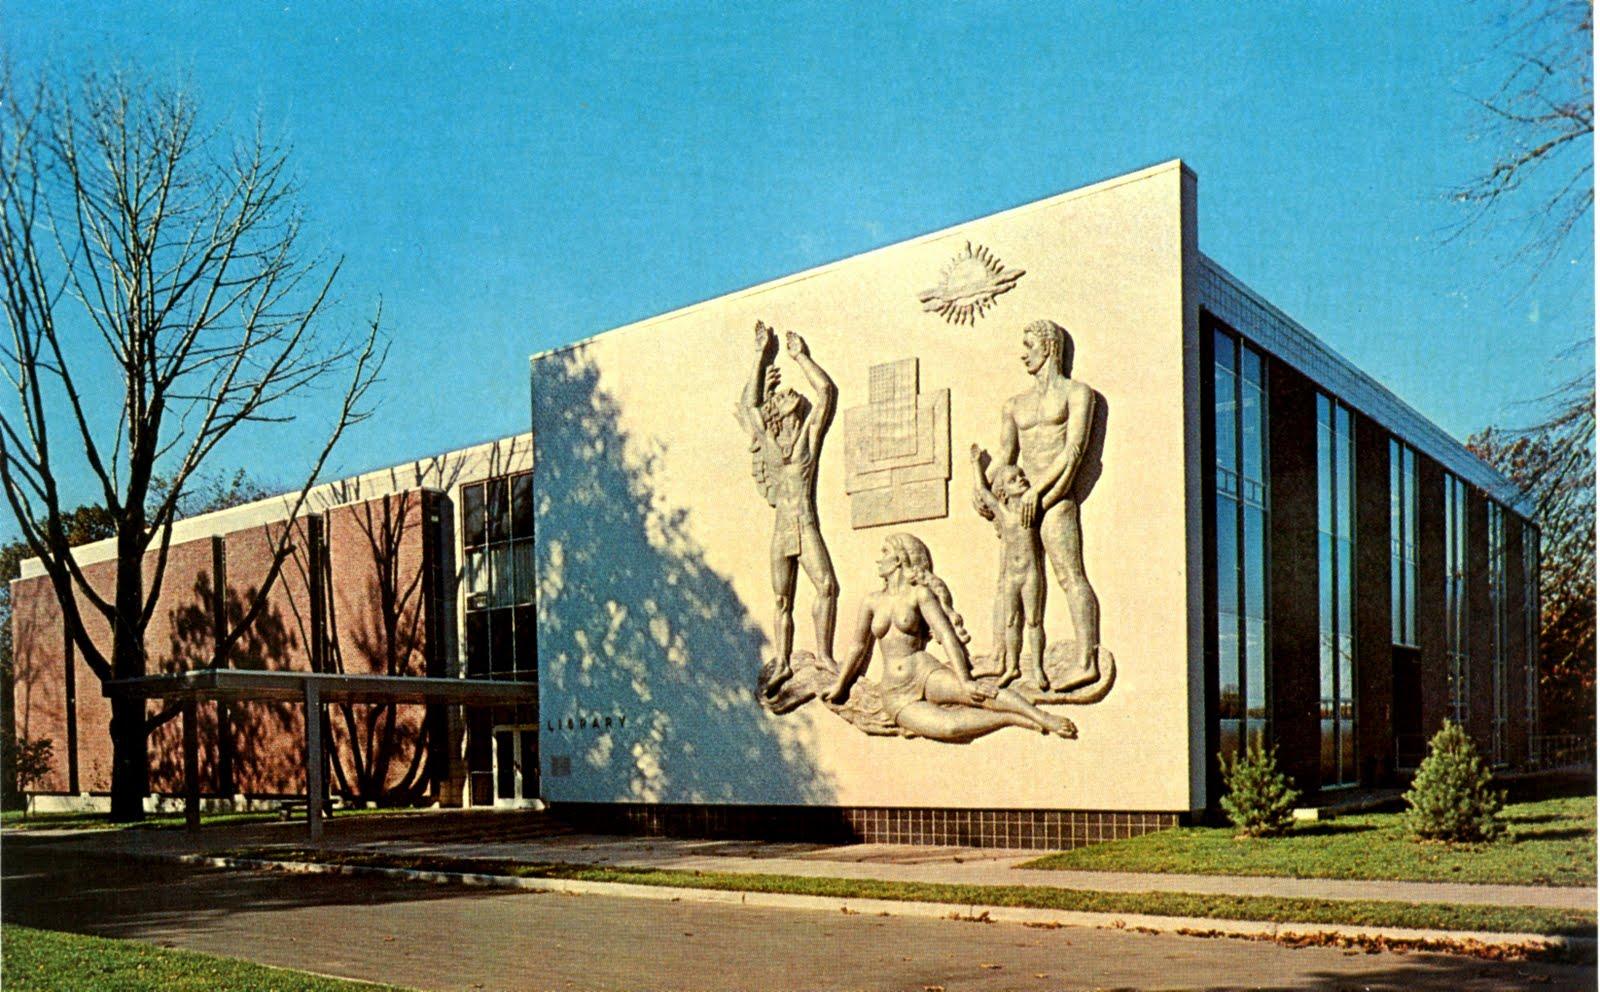 ... : Library, Fairleigh Dickinson University, Teaneck, New Jersey: http://librarypostcards.blogspot.com/2011/11/library-fairleigh-dickinson-university_28.html